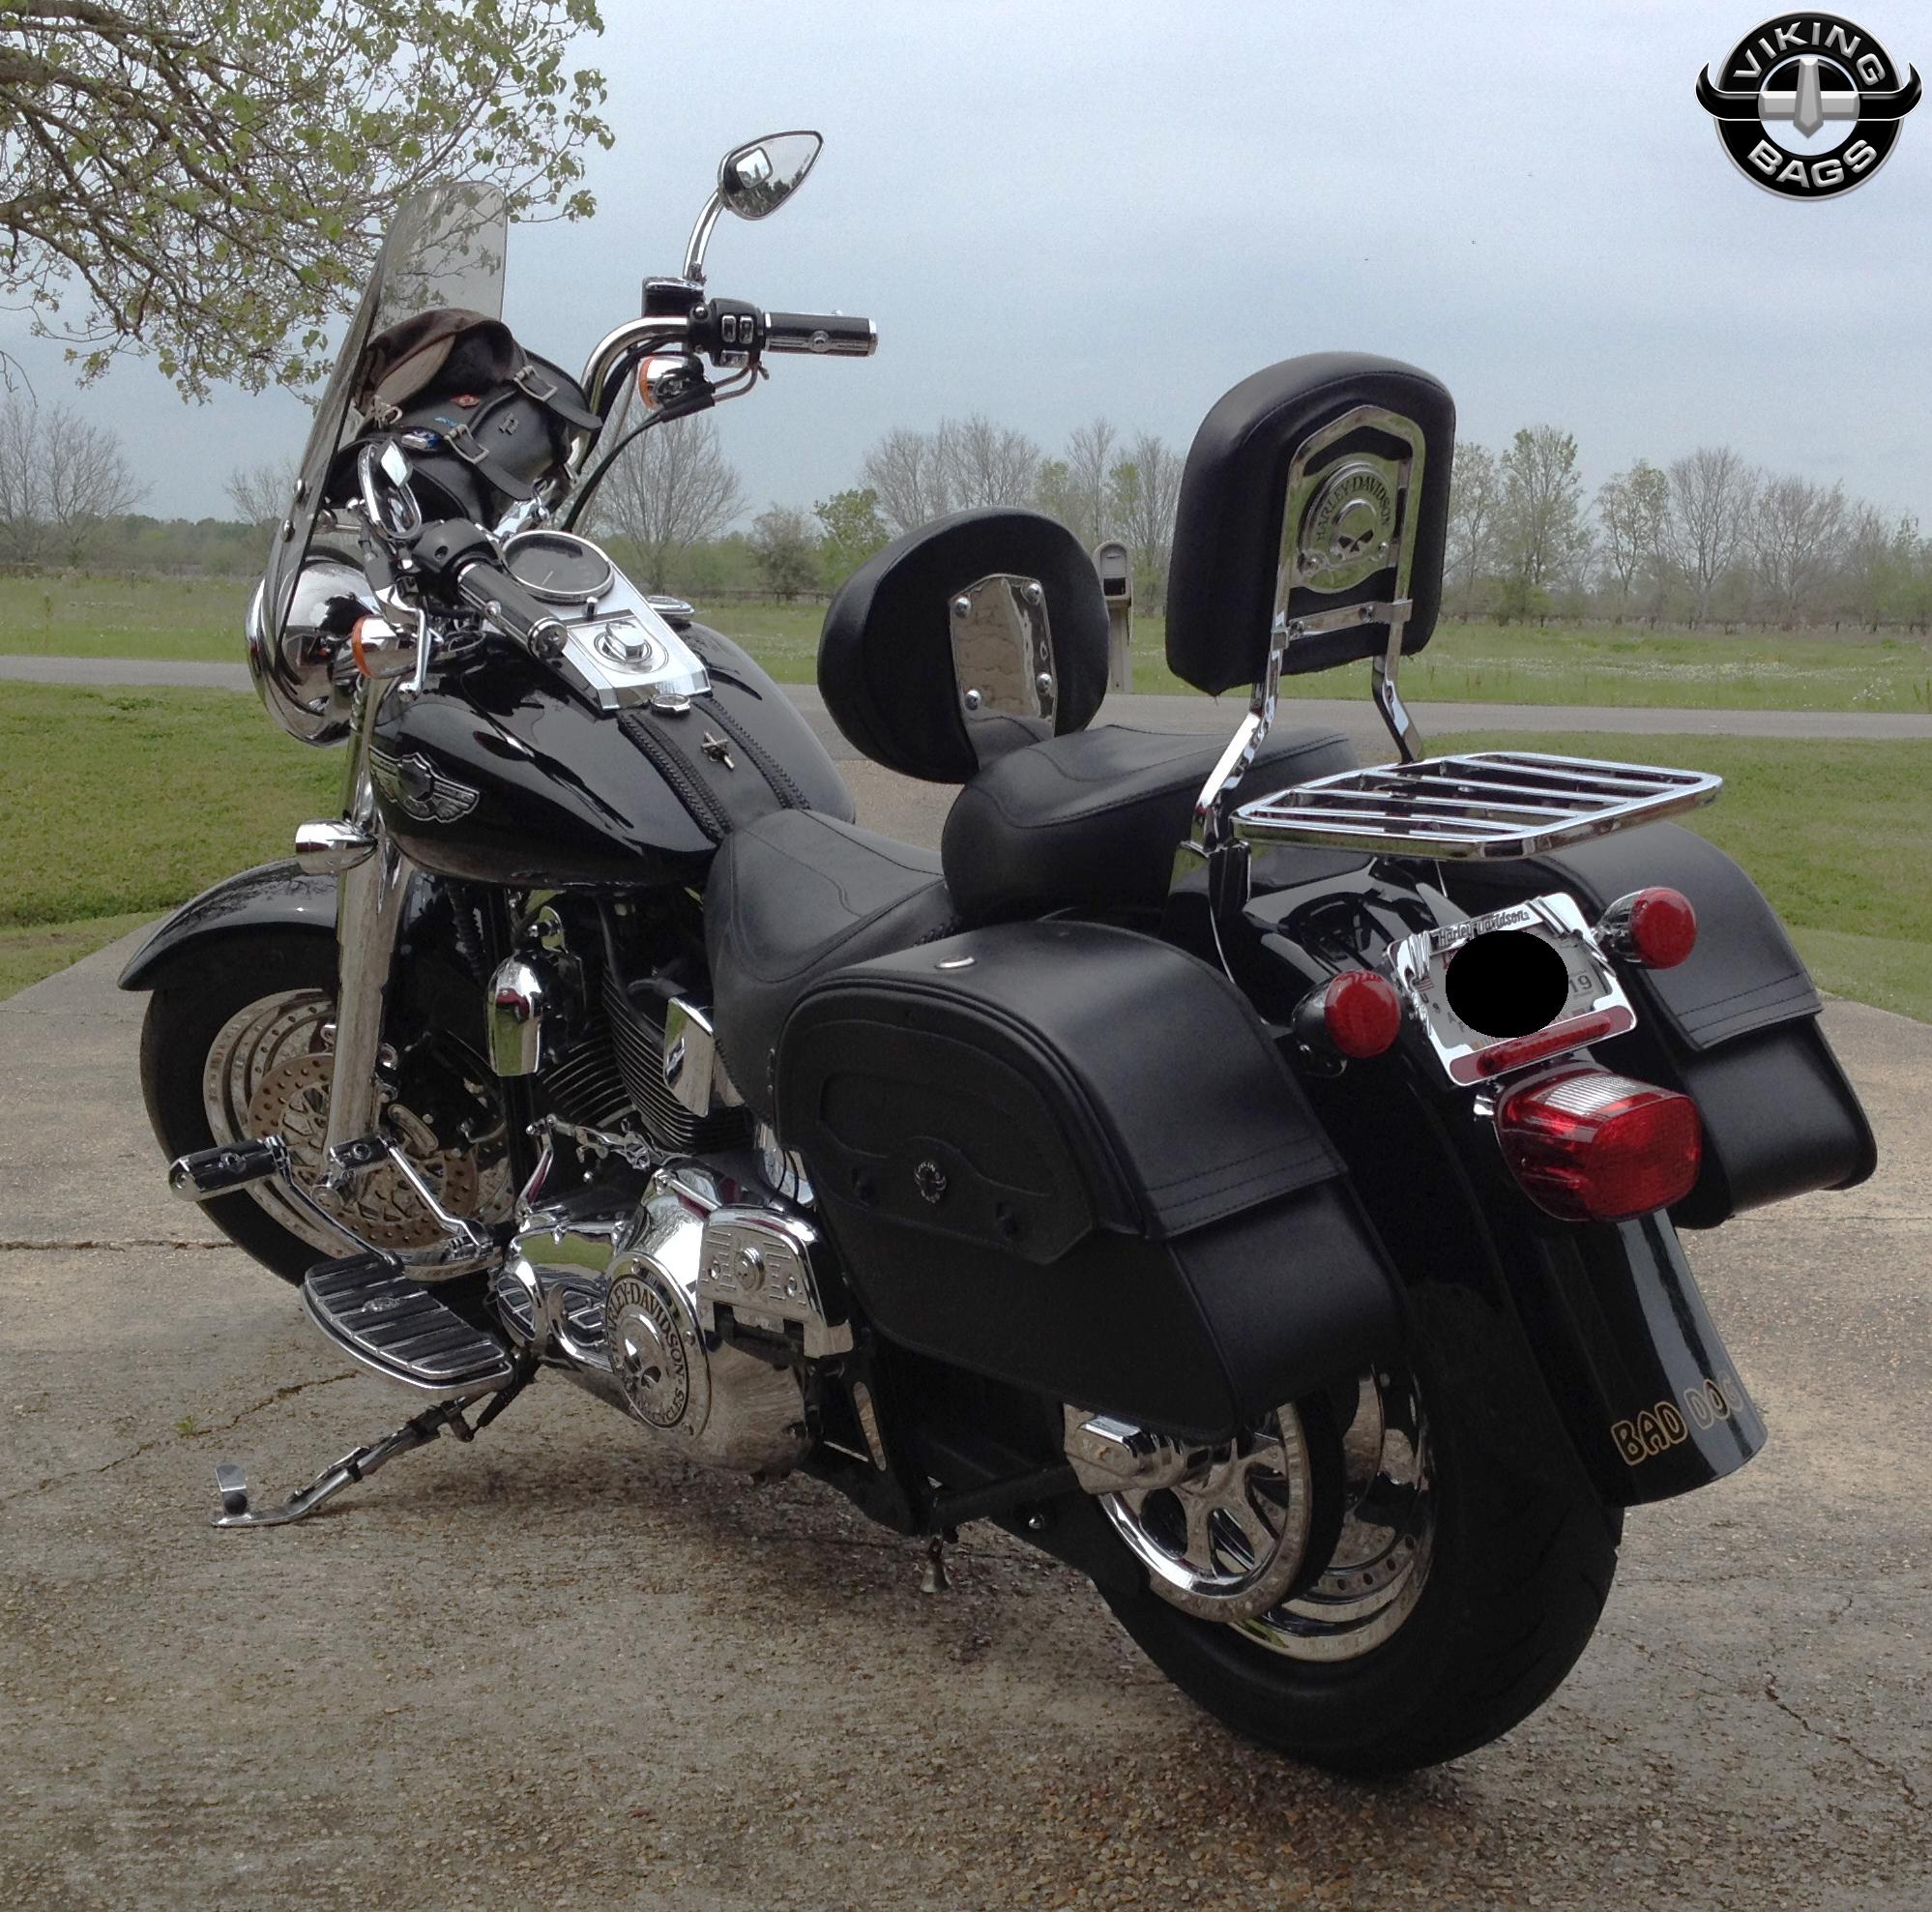 Harley davidson softail motorcycle luggage customer photo for Motor cycle saddle bags